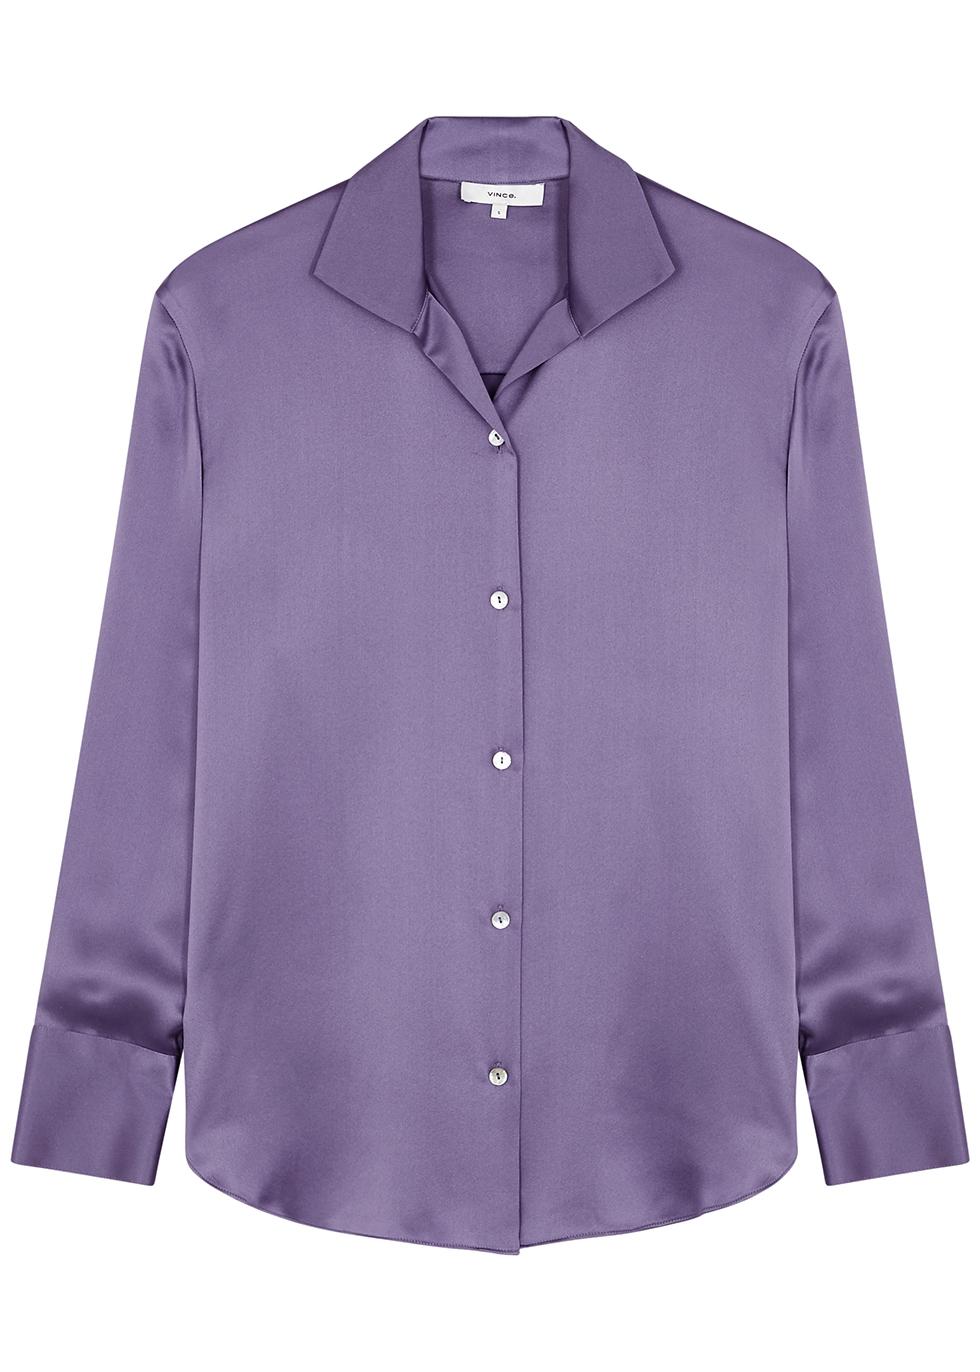 Lilac silk shirt